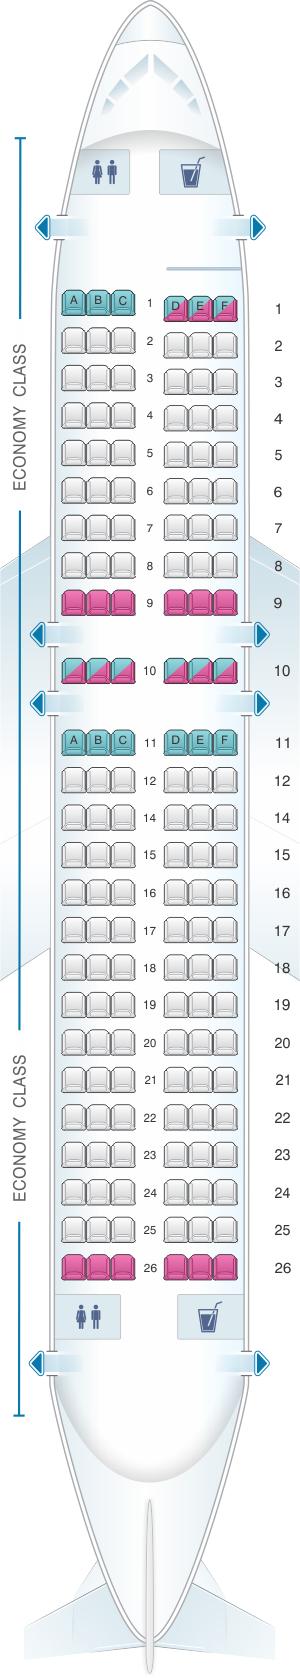 how to choose seats on cebu pacific